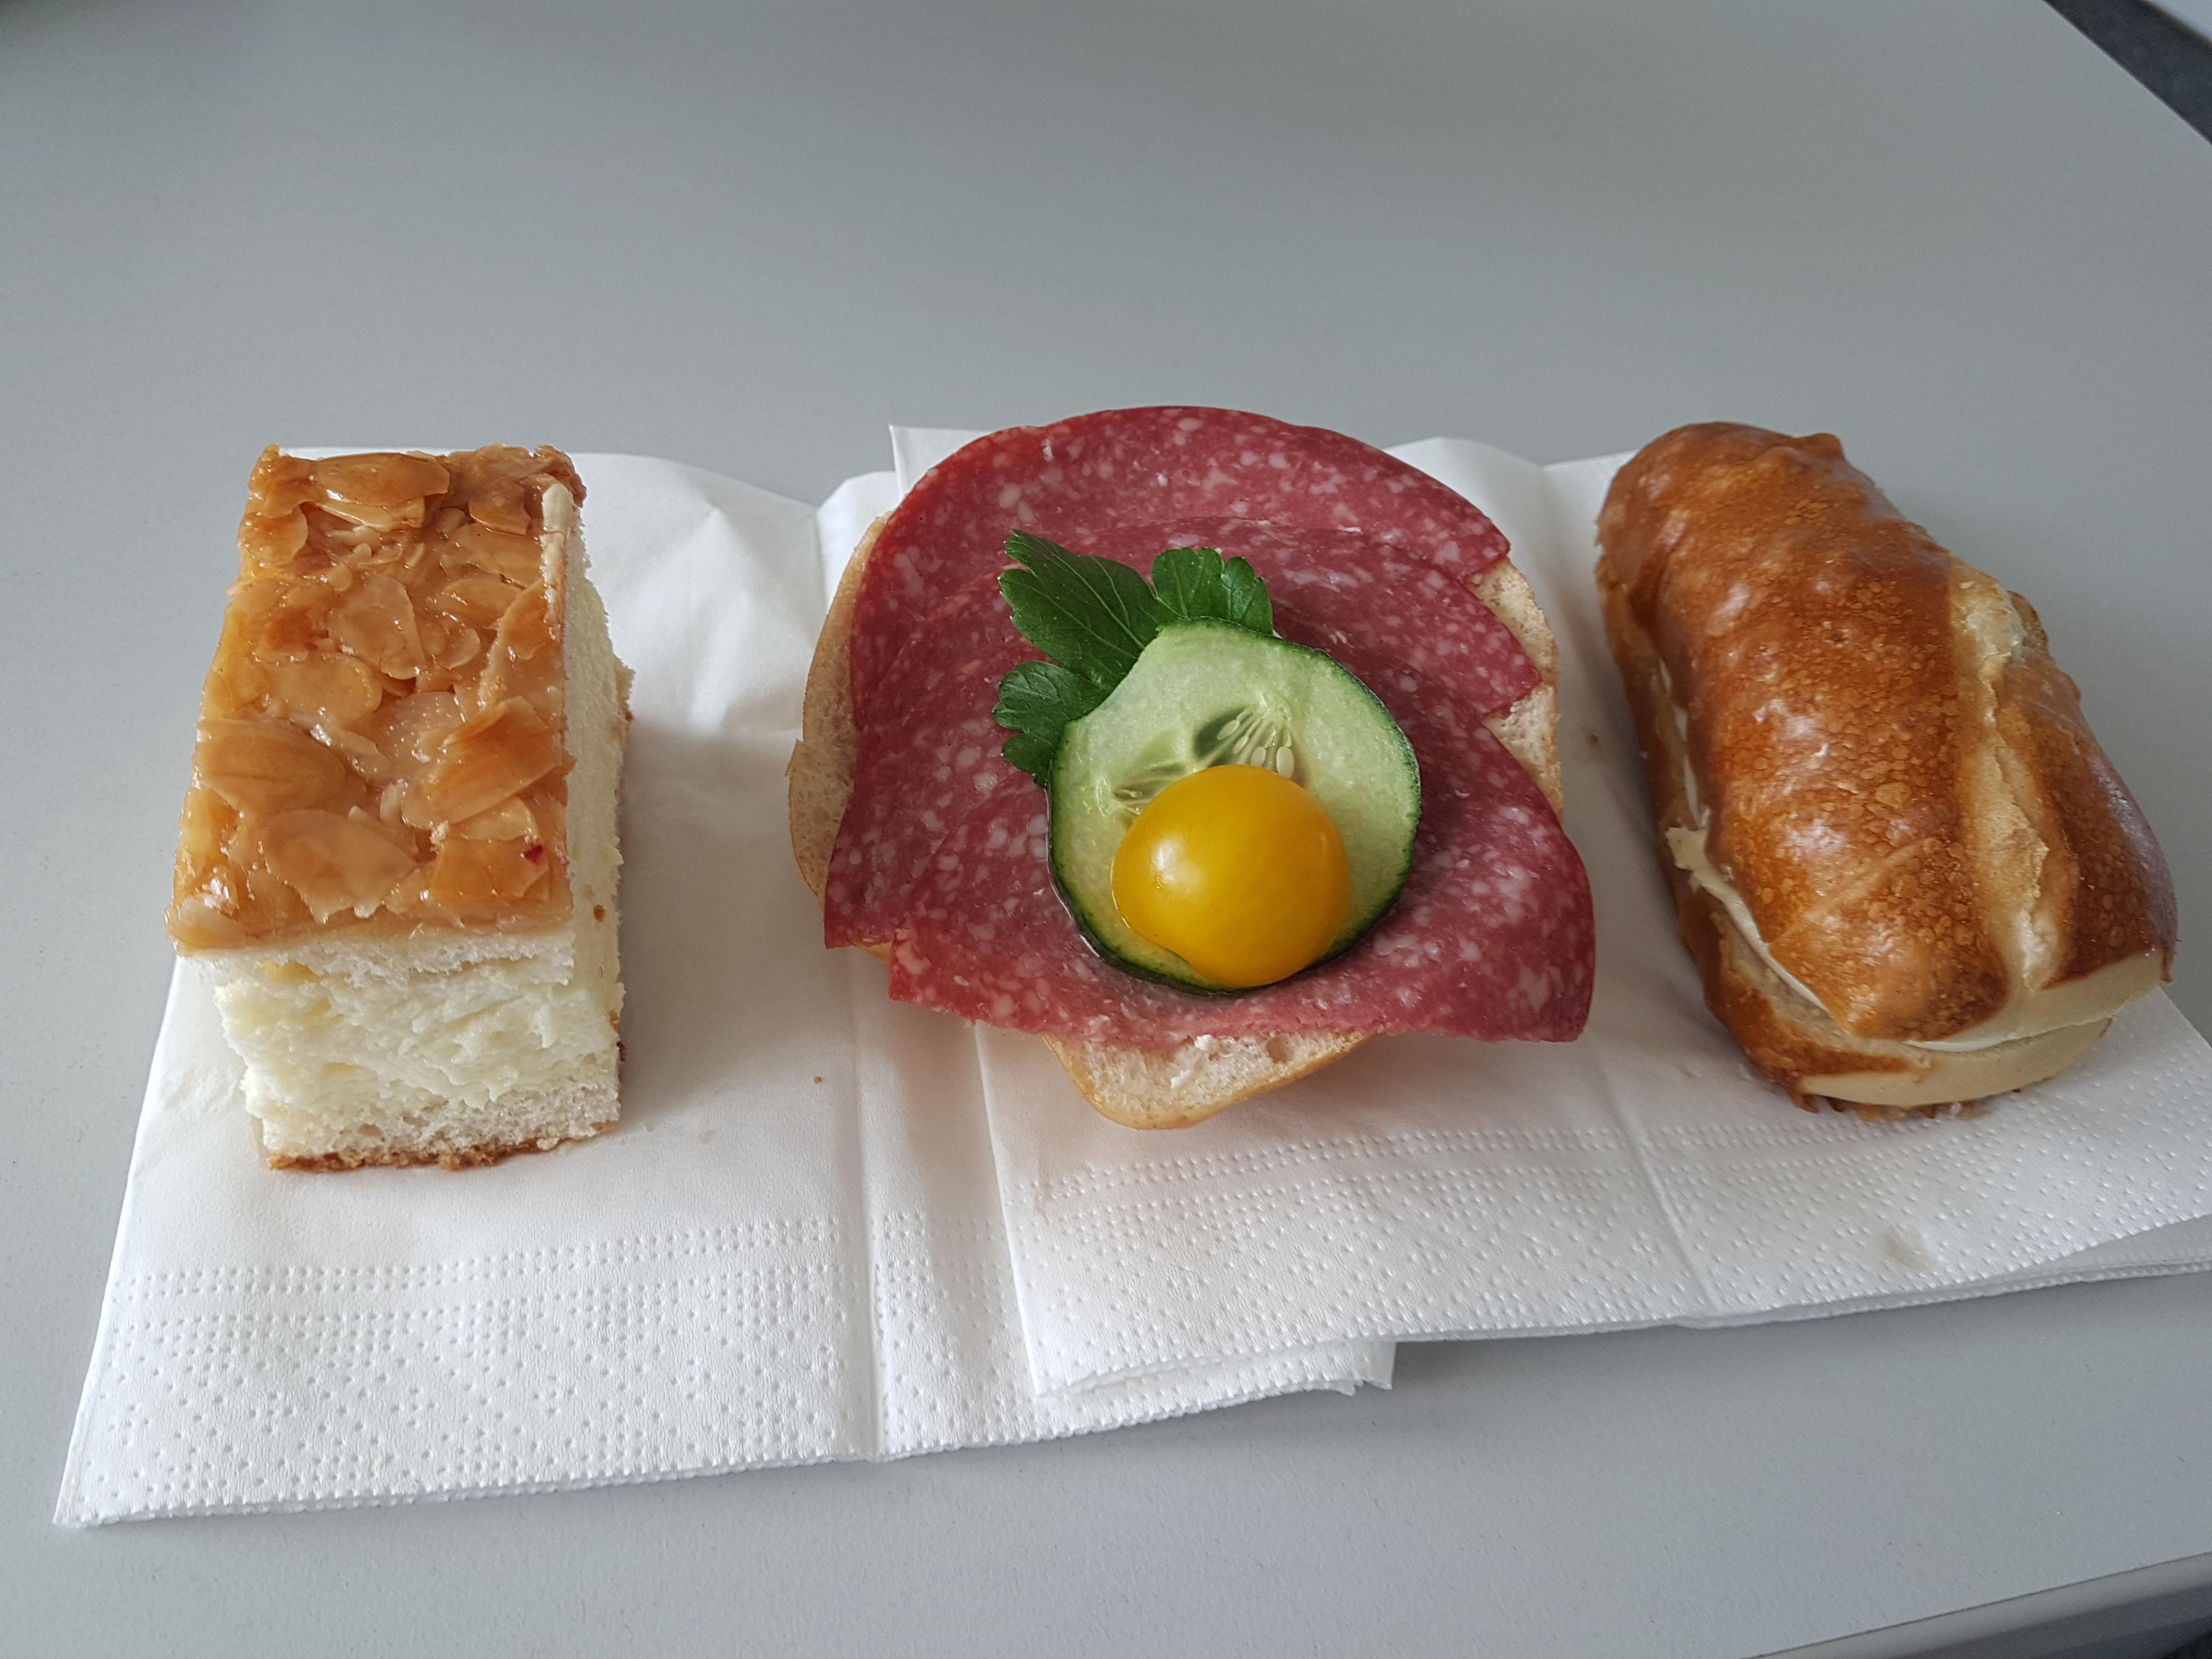 http://foodloader.net/Holz_2018-08-02_Snacks.jpg